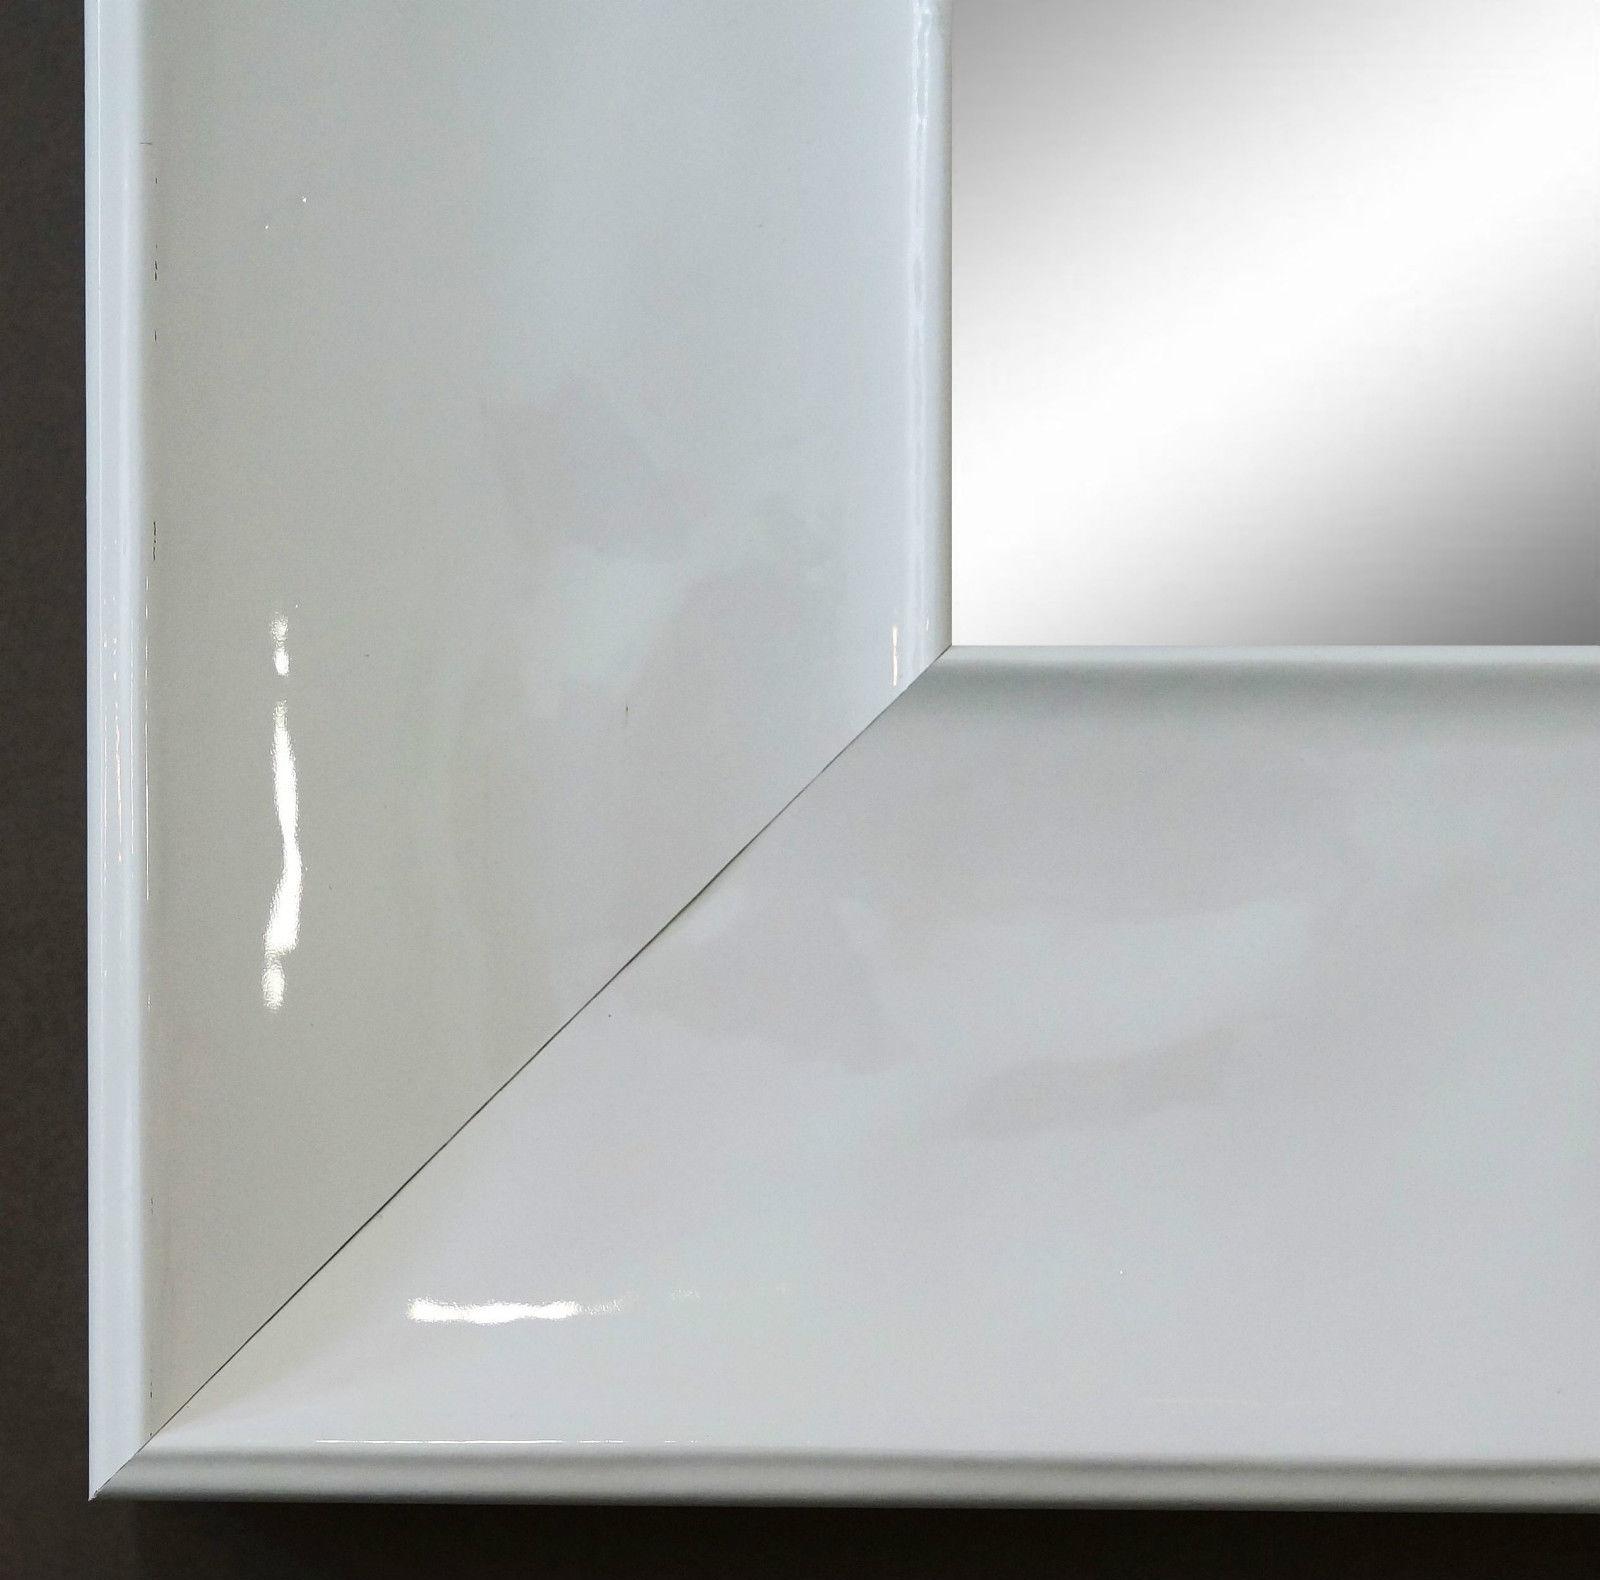 wandspiegel gnstig kaufen wandspiegel antje modern cm with wandspiegel gnstig kaufen. Black Bedroom Furniture Sets. Home Design Ideas